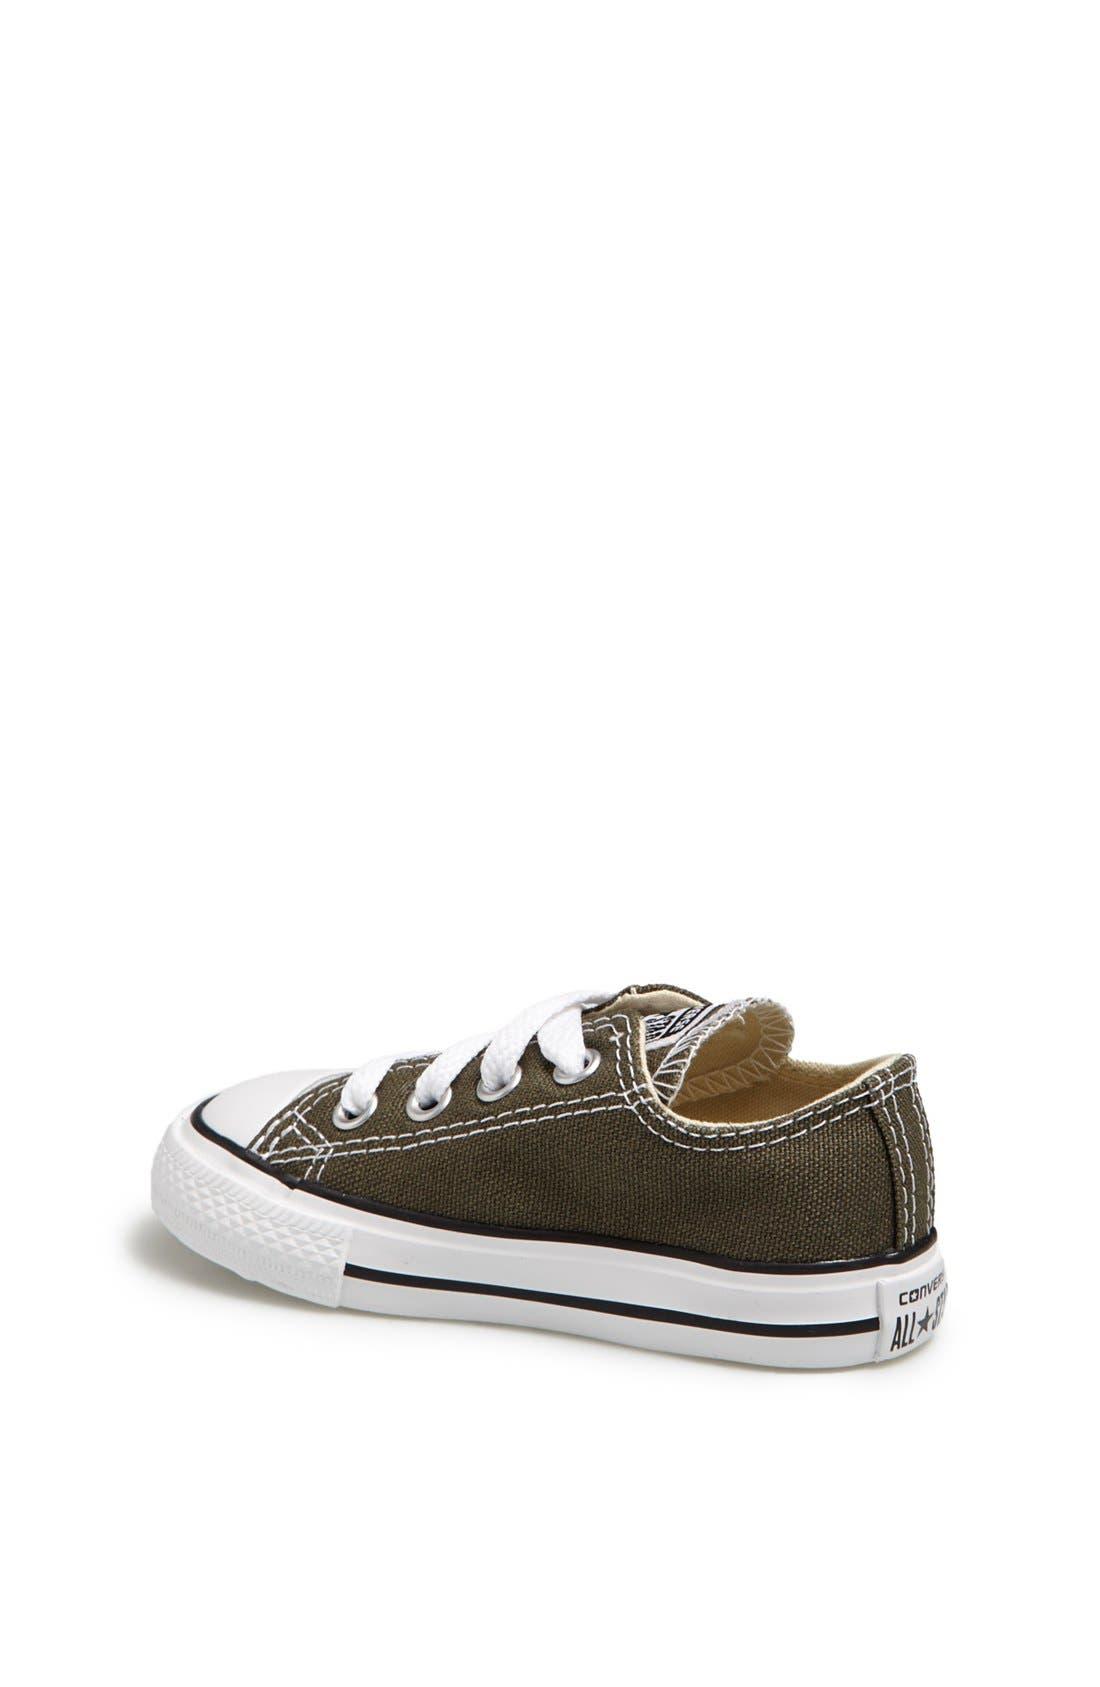 Alternate Image 2  - Converse Chuck Taylor® All Star® Sneaker (Baby, Walker & Toddler)